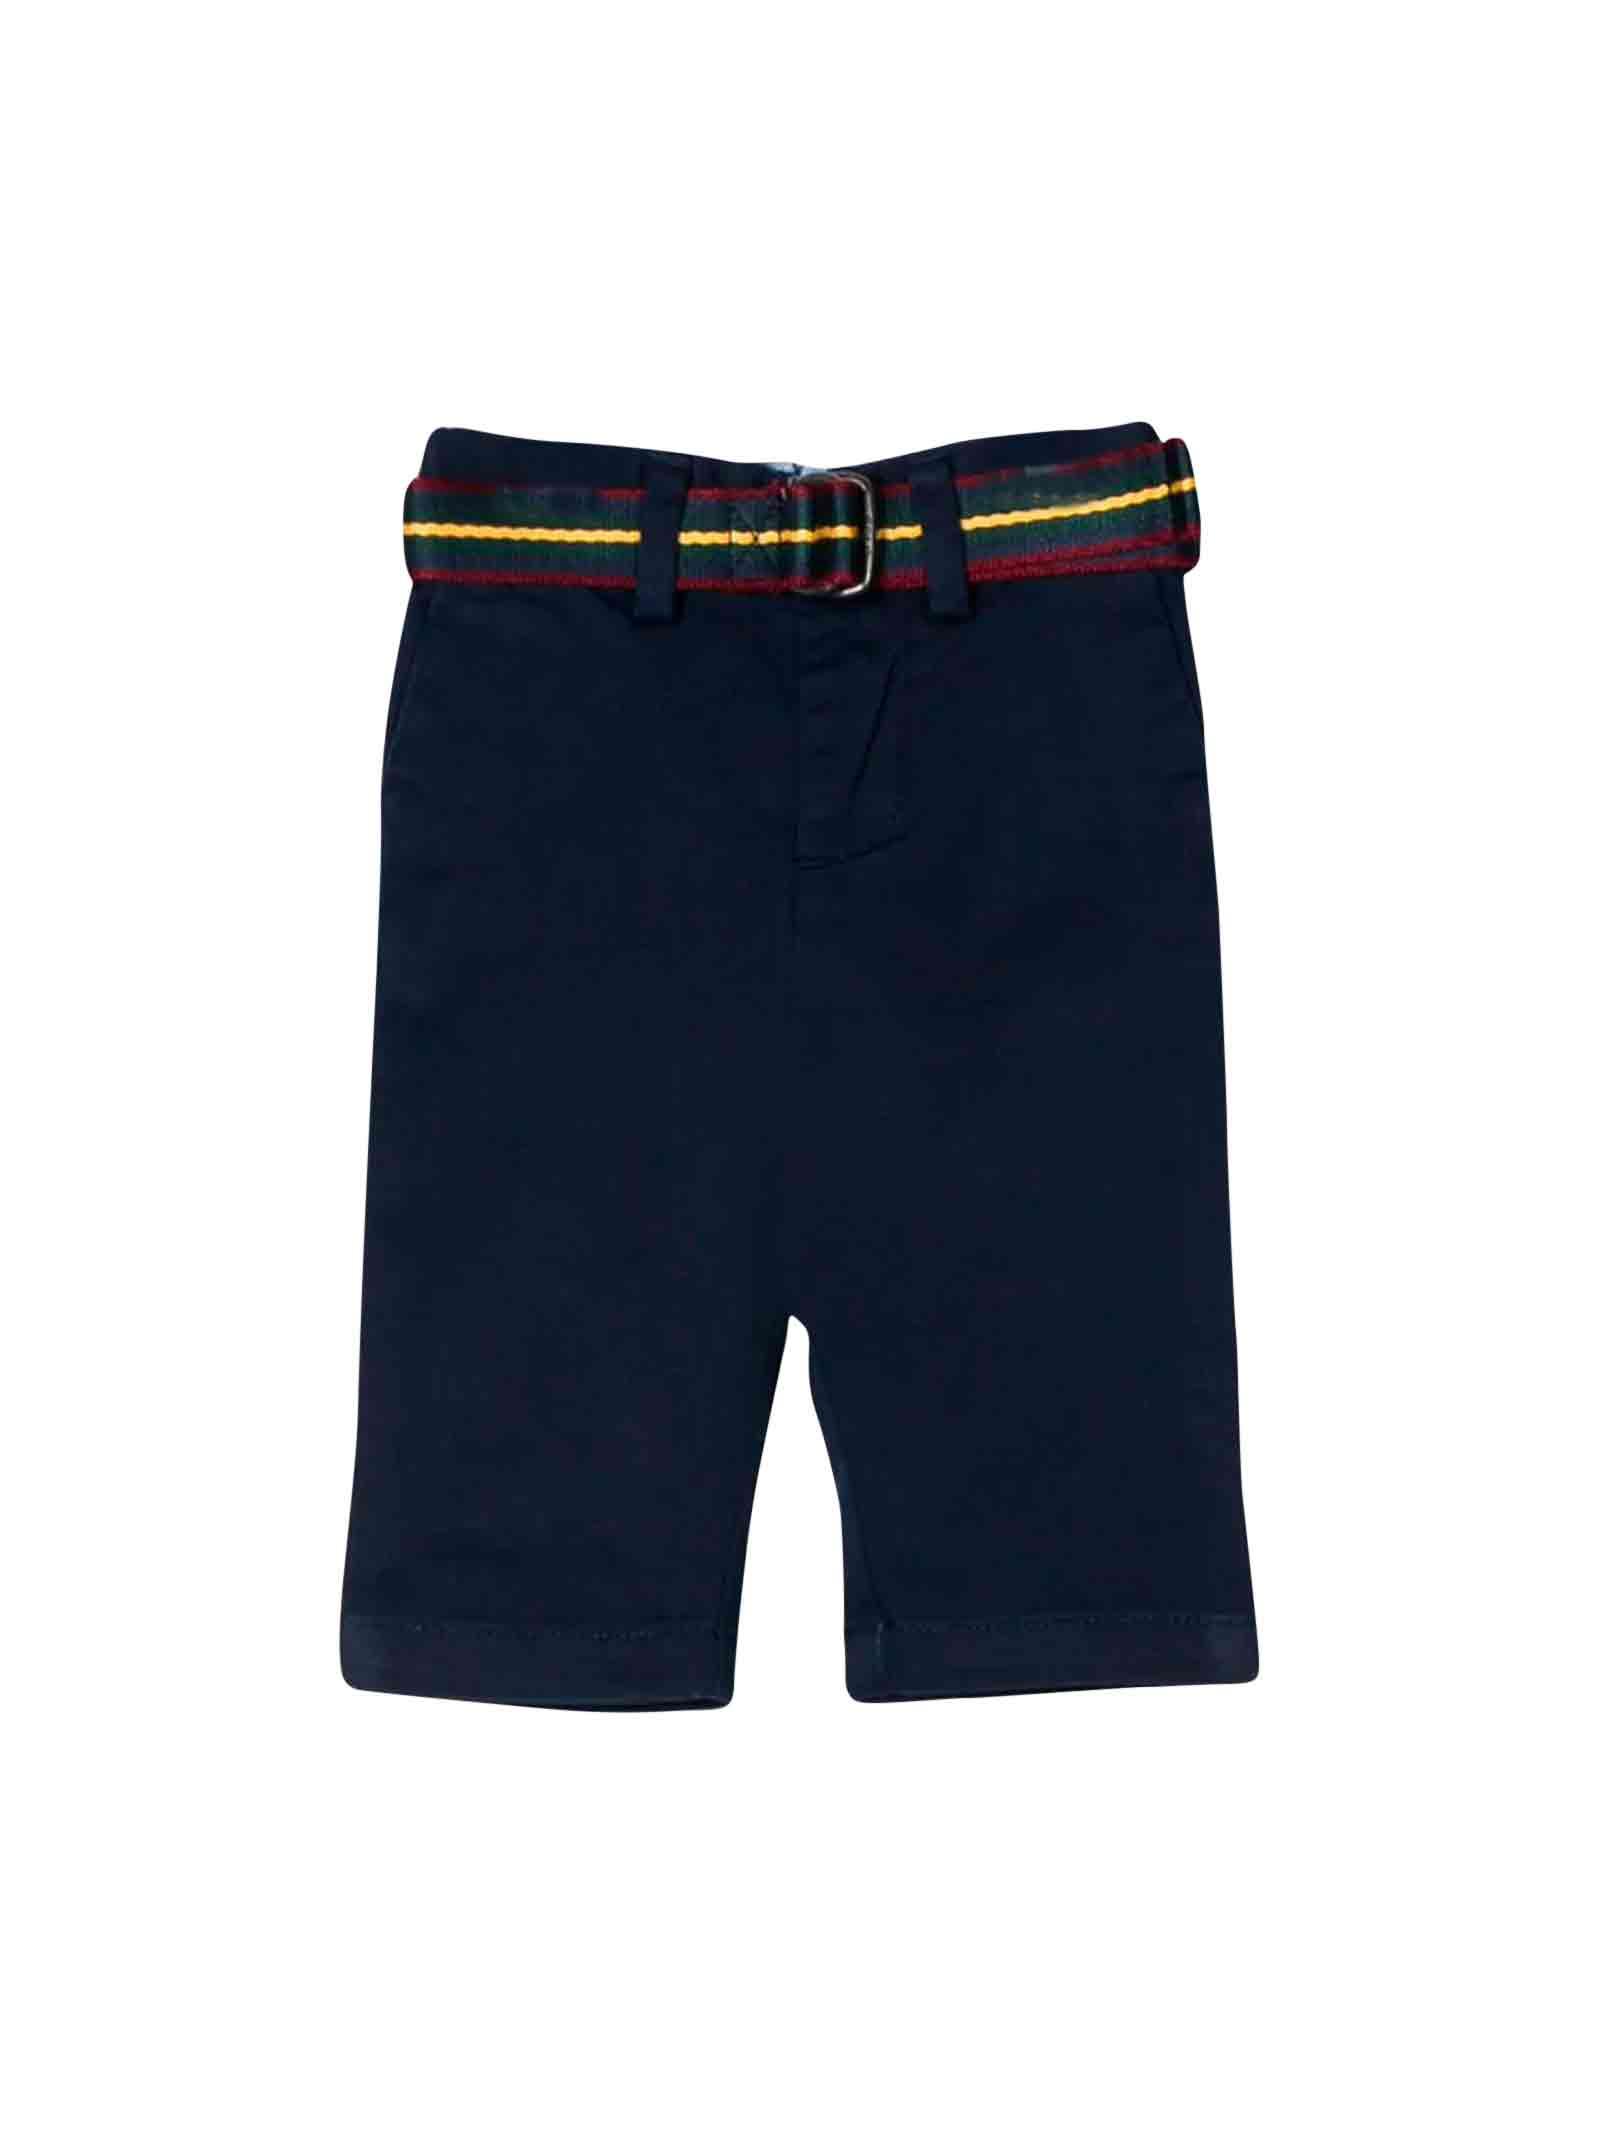 new arrivals 1b27c 353a2 Pantalone blu neonato Ralph Lauren kids